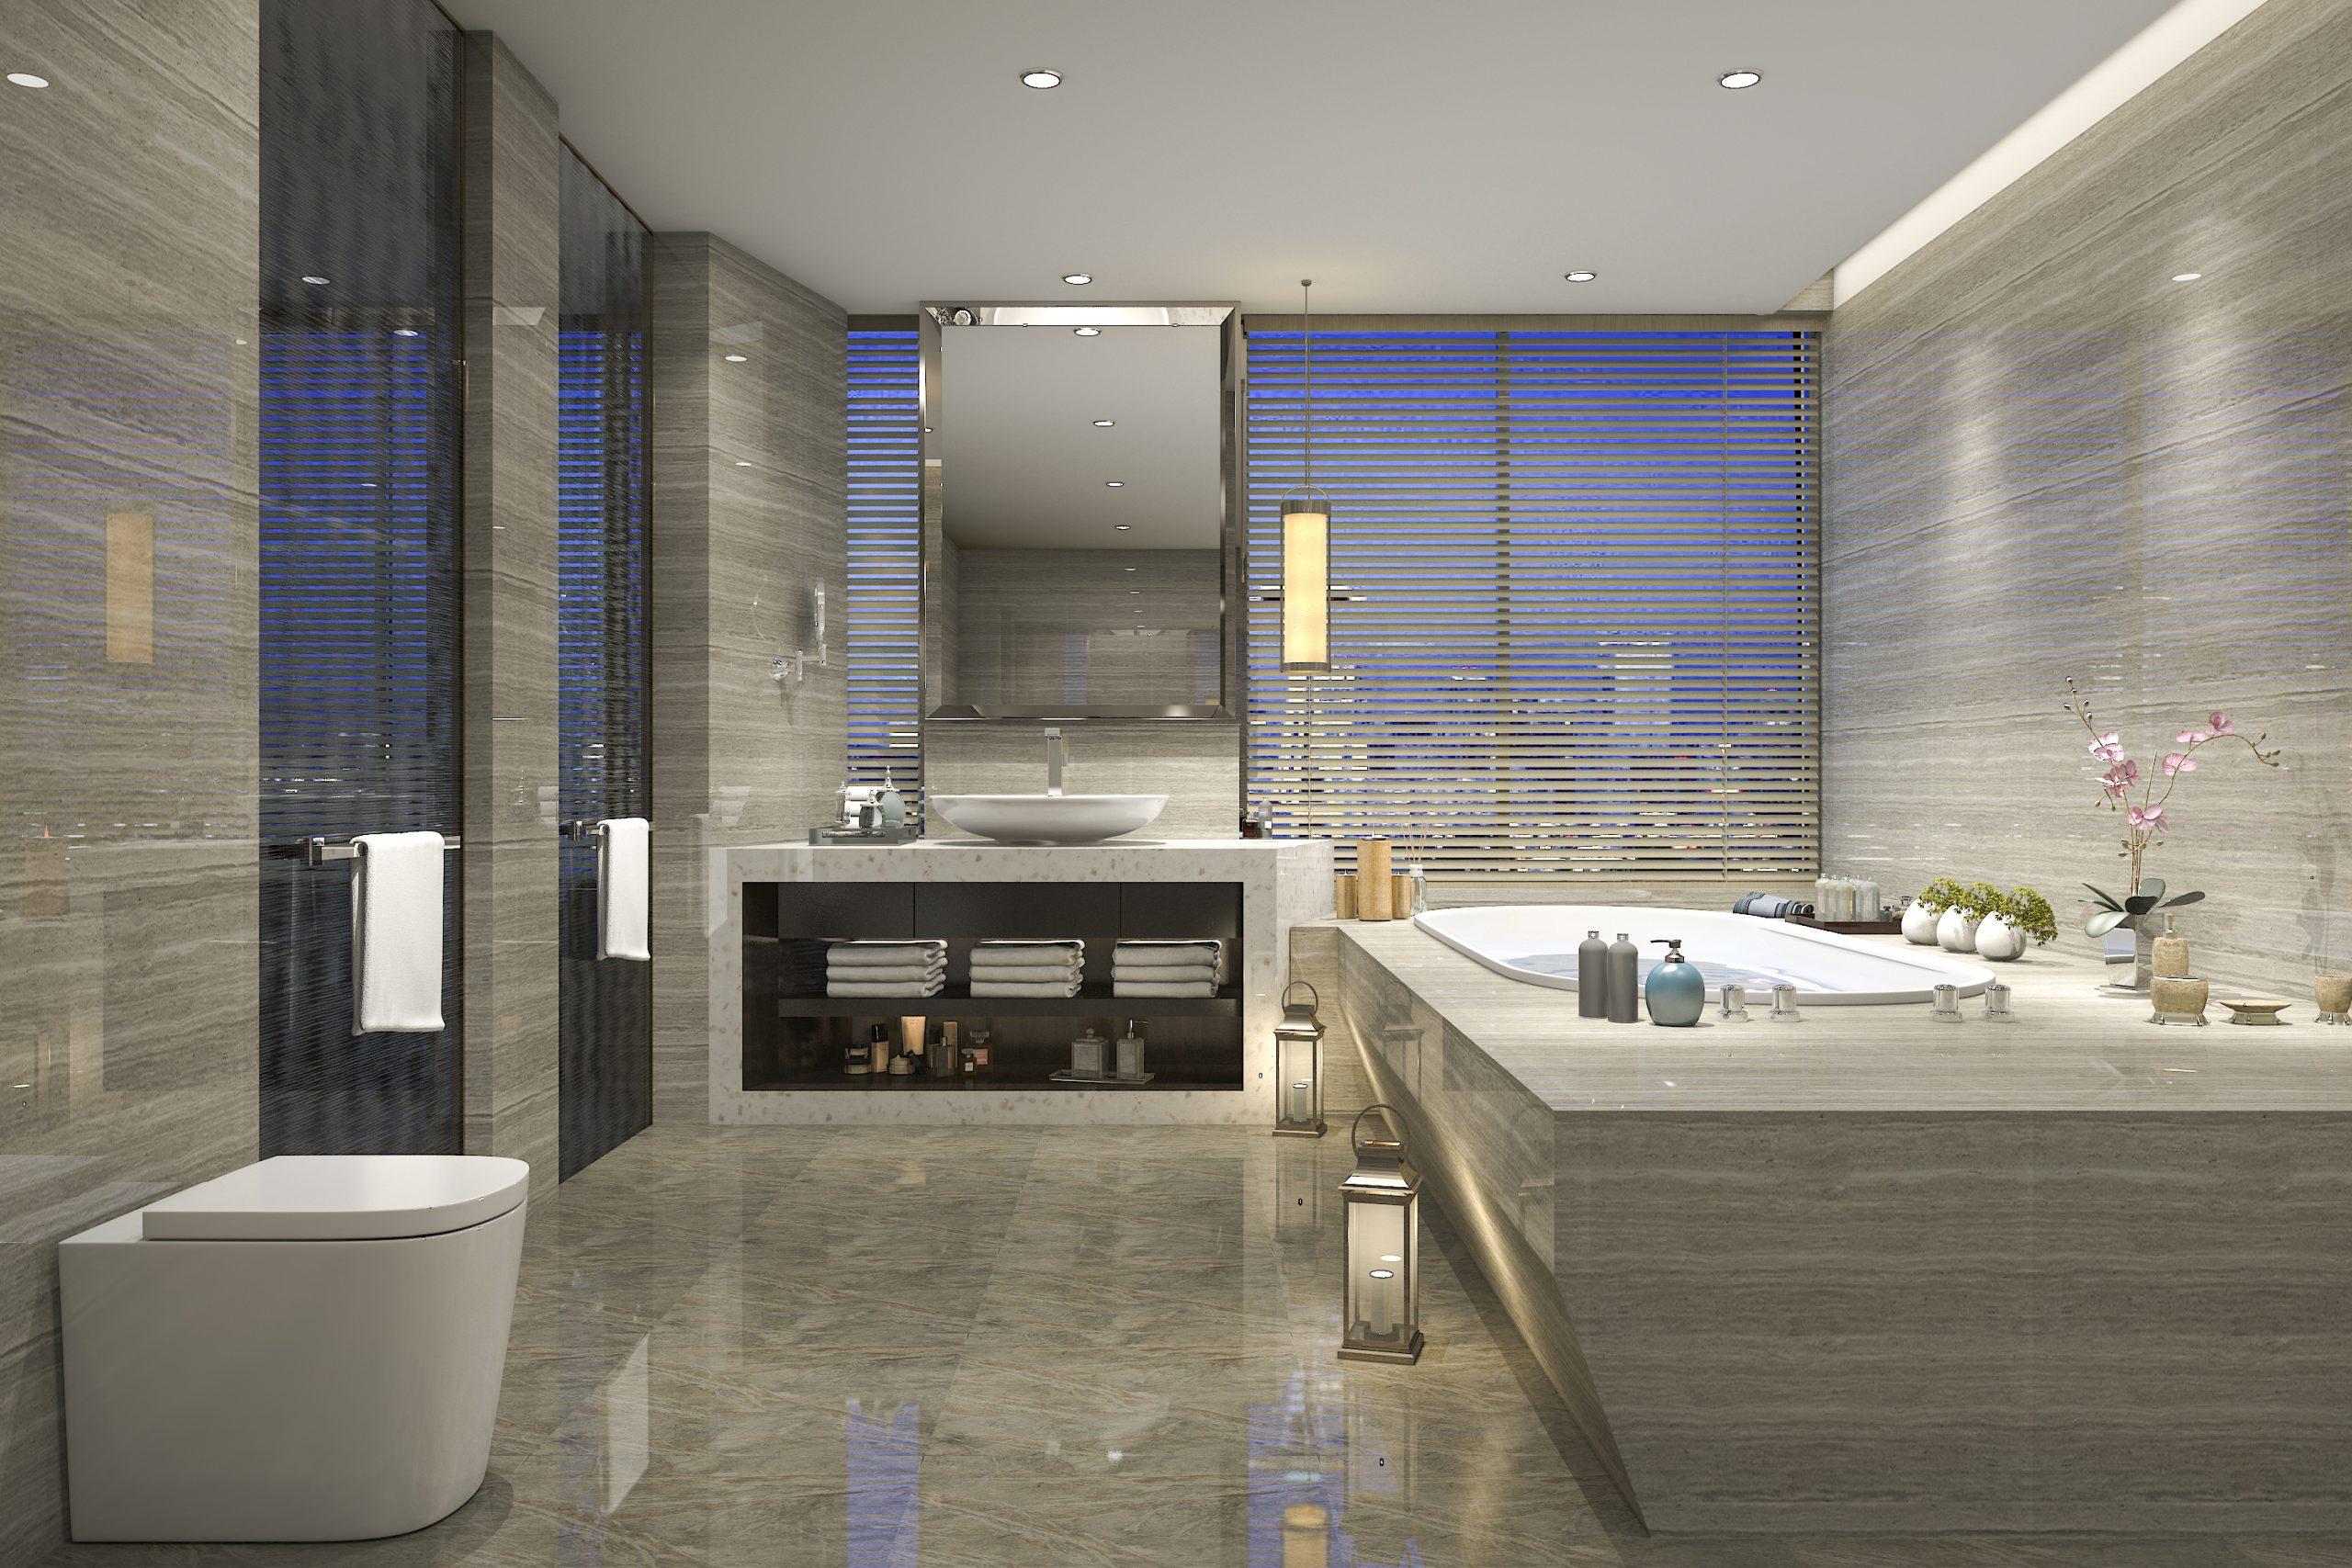 How to find Best Bathroom Renovation Contractors Maryland